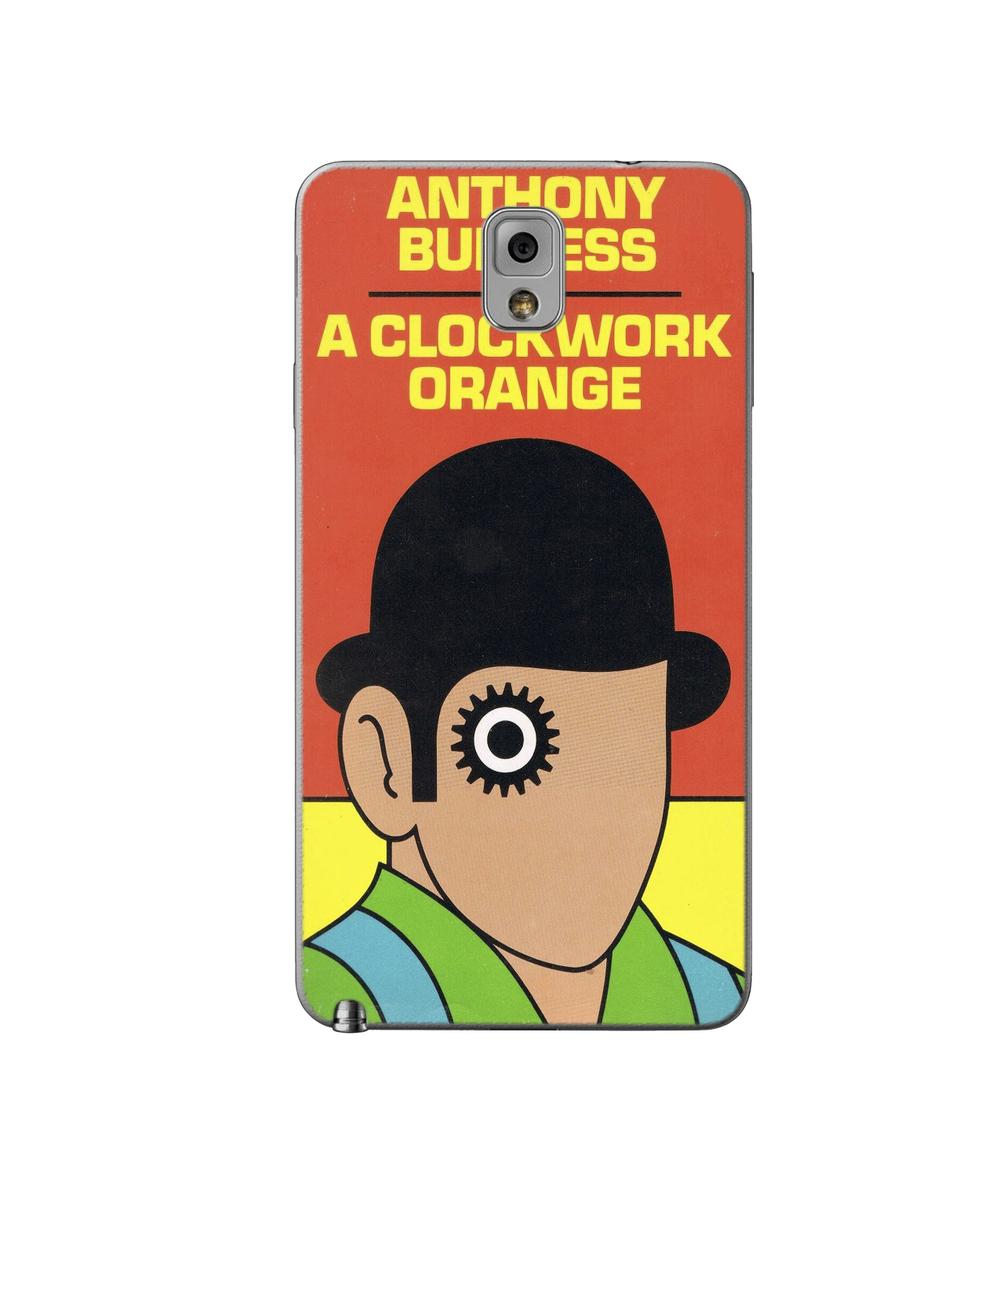 Clockwork Orange Cover Art